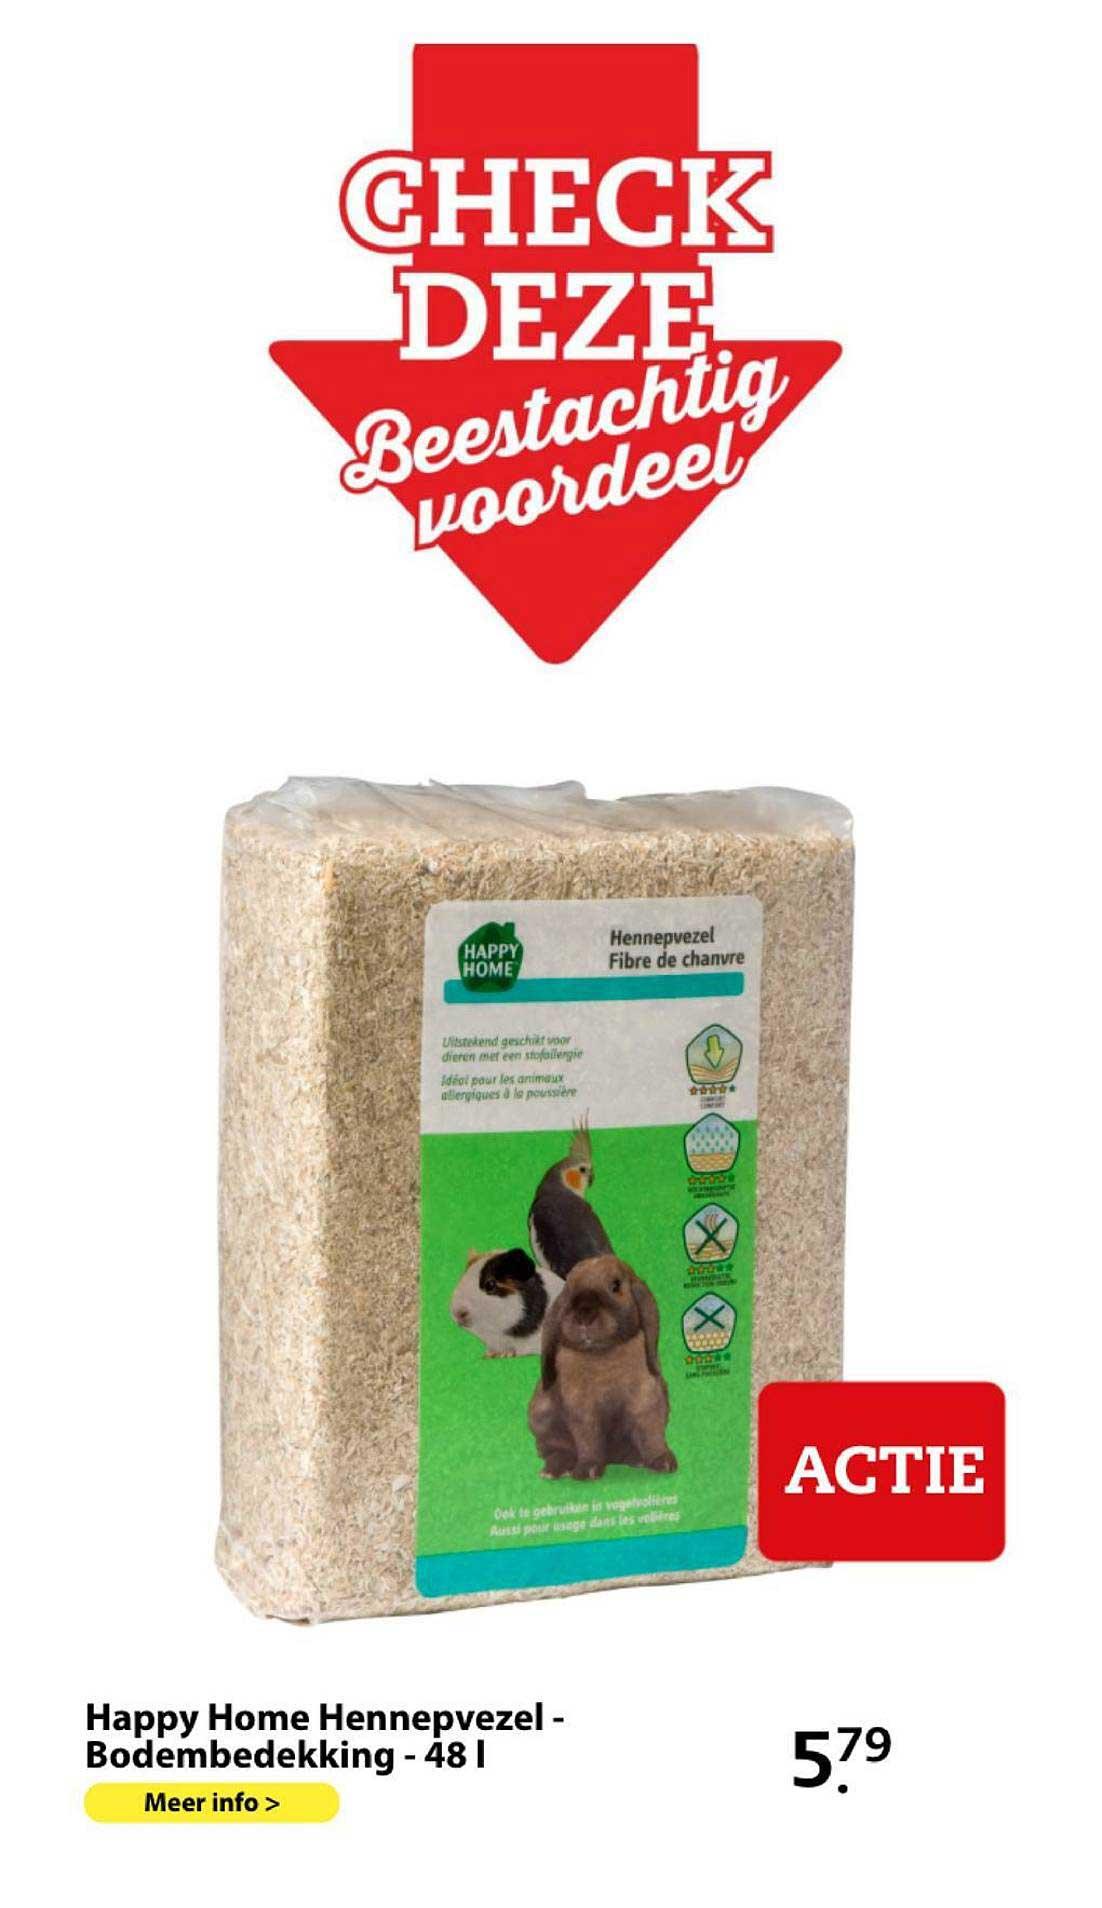 Boerenbond Happy Home Hennepvezel - Bodembedekking - 48 L